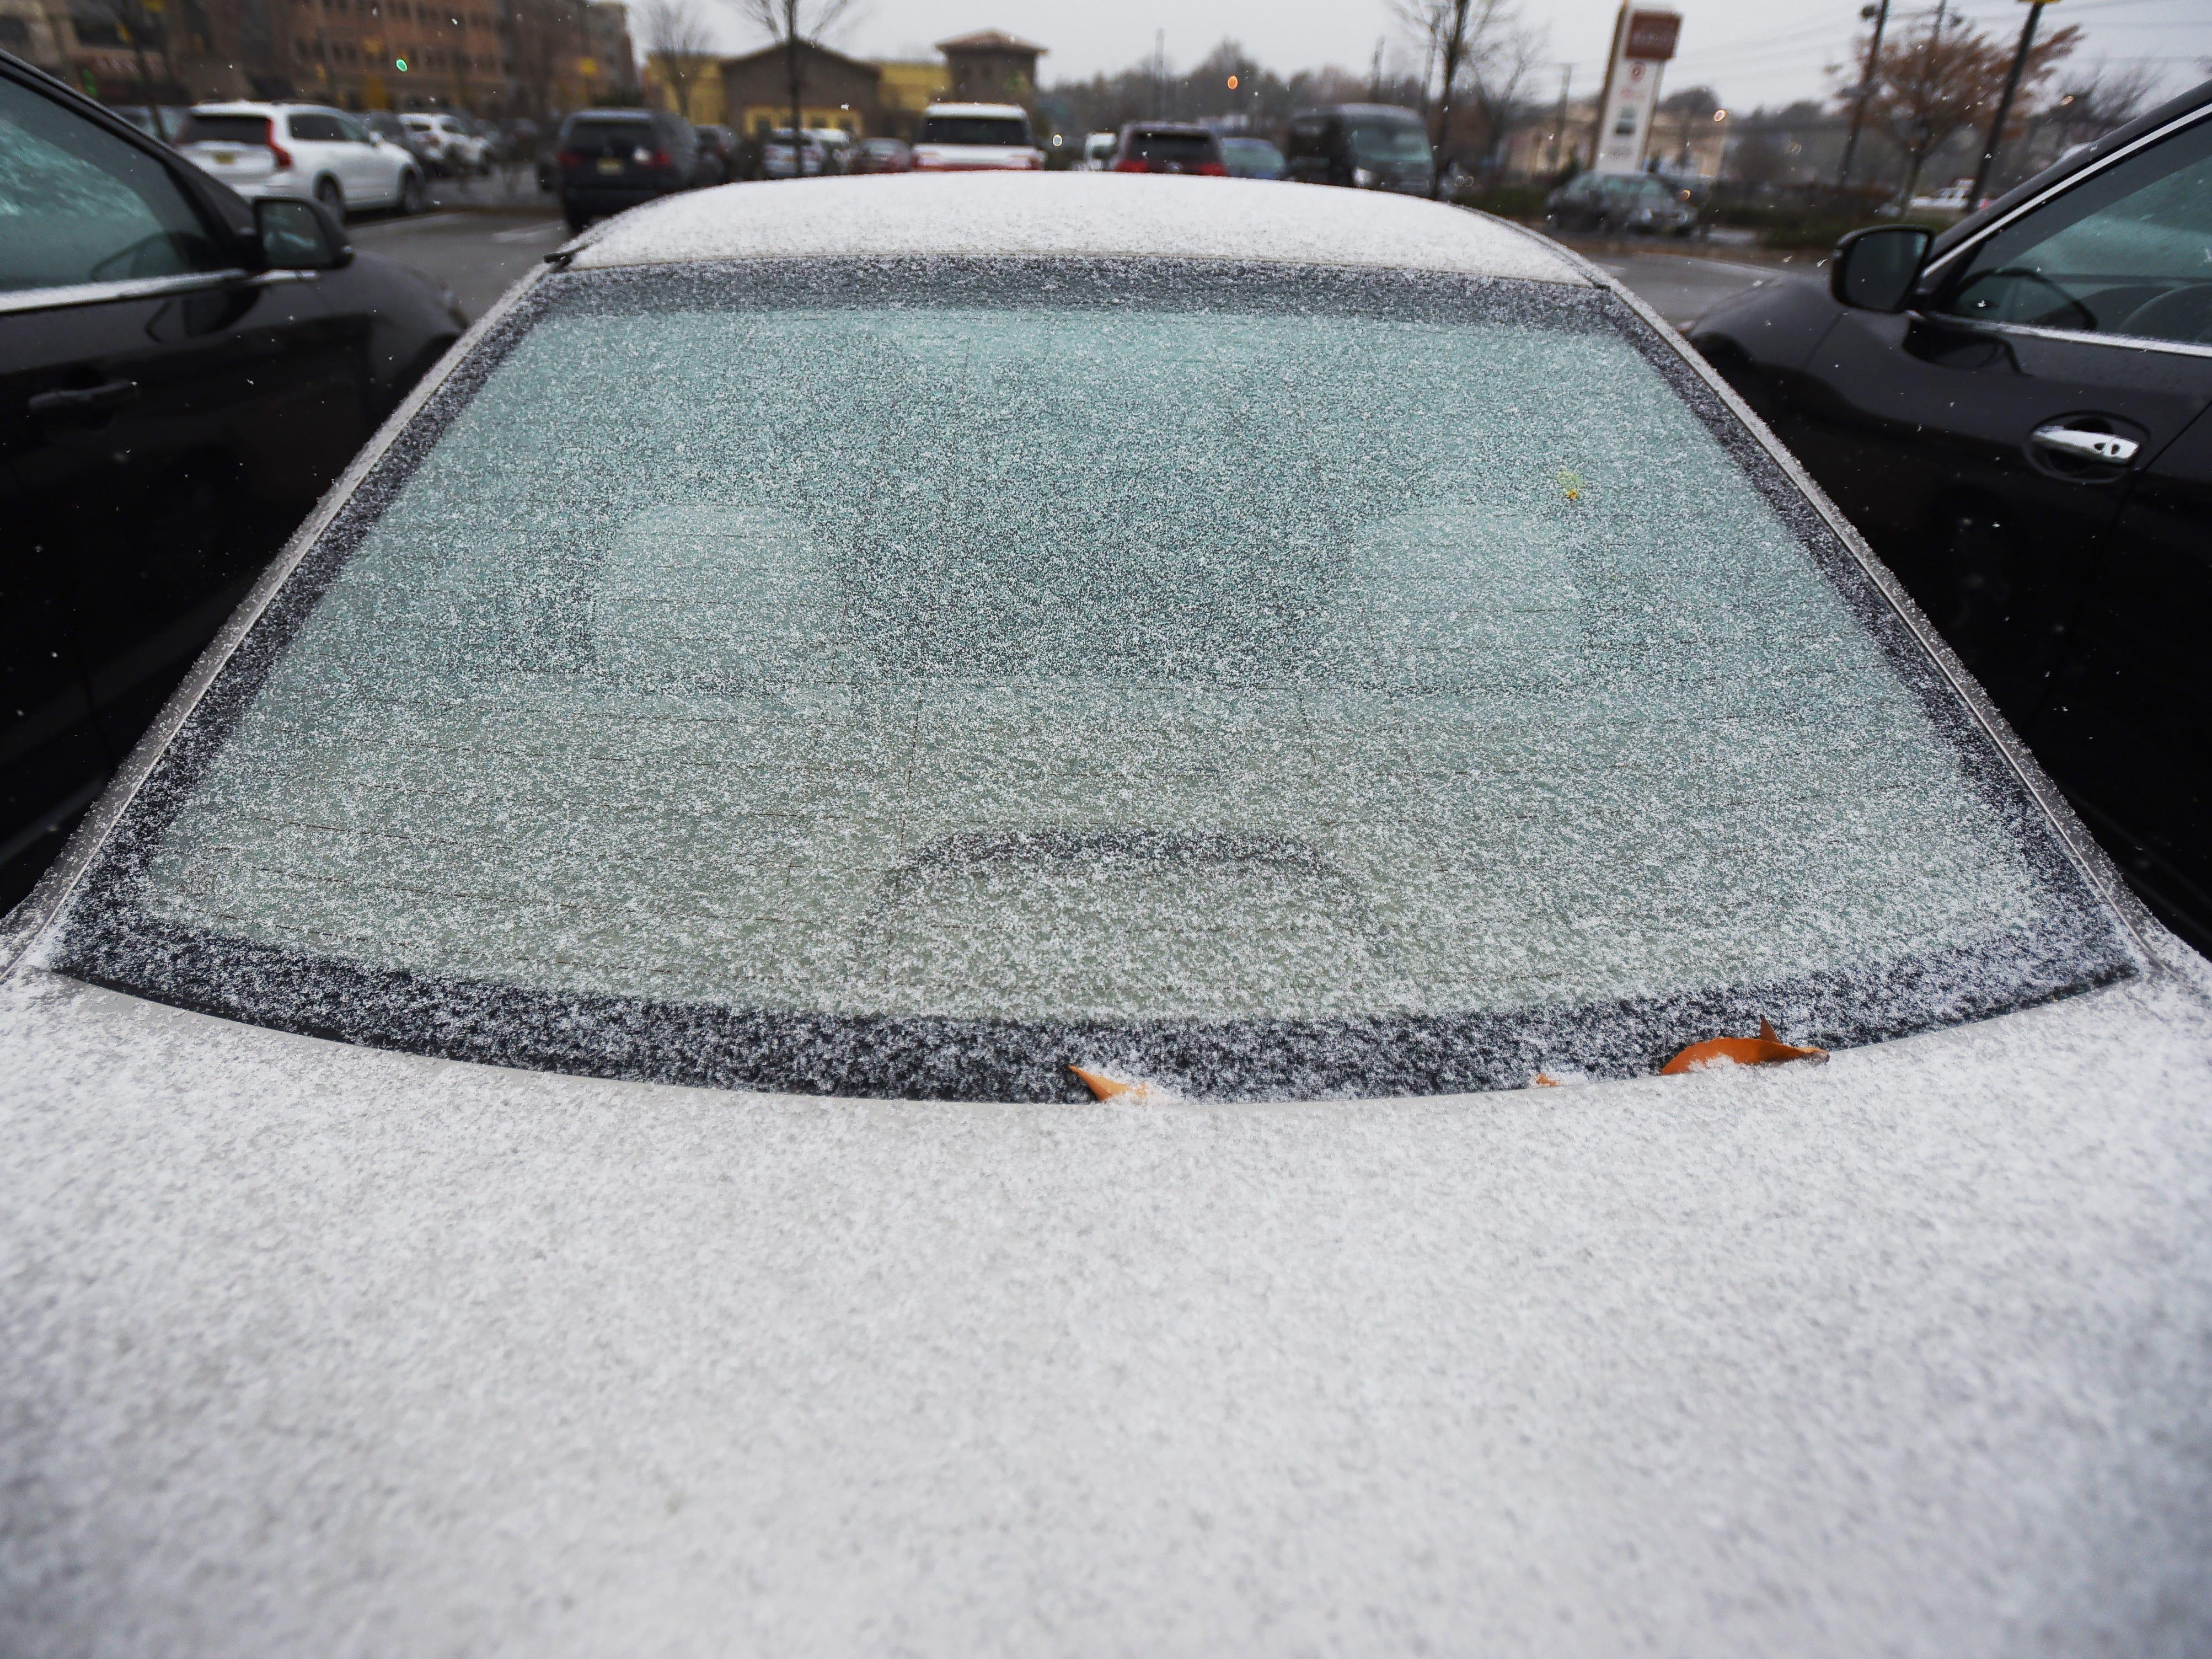 November 15, 2018, Paramus, NJ, USASnow begins to cover a car at Bergen Town Center.